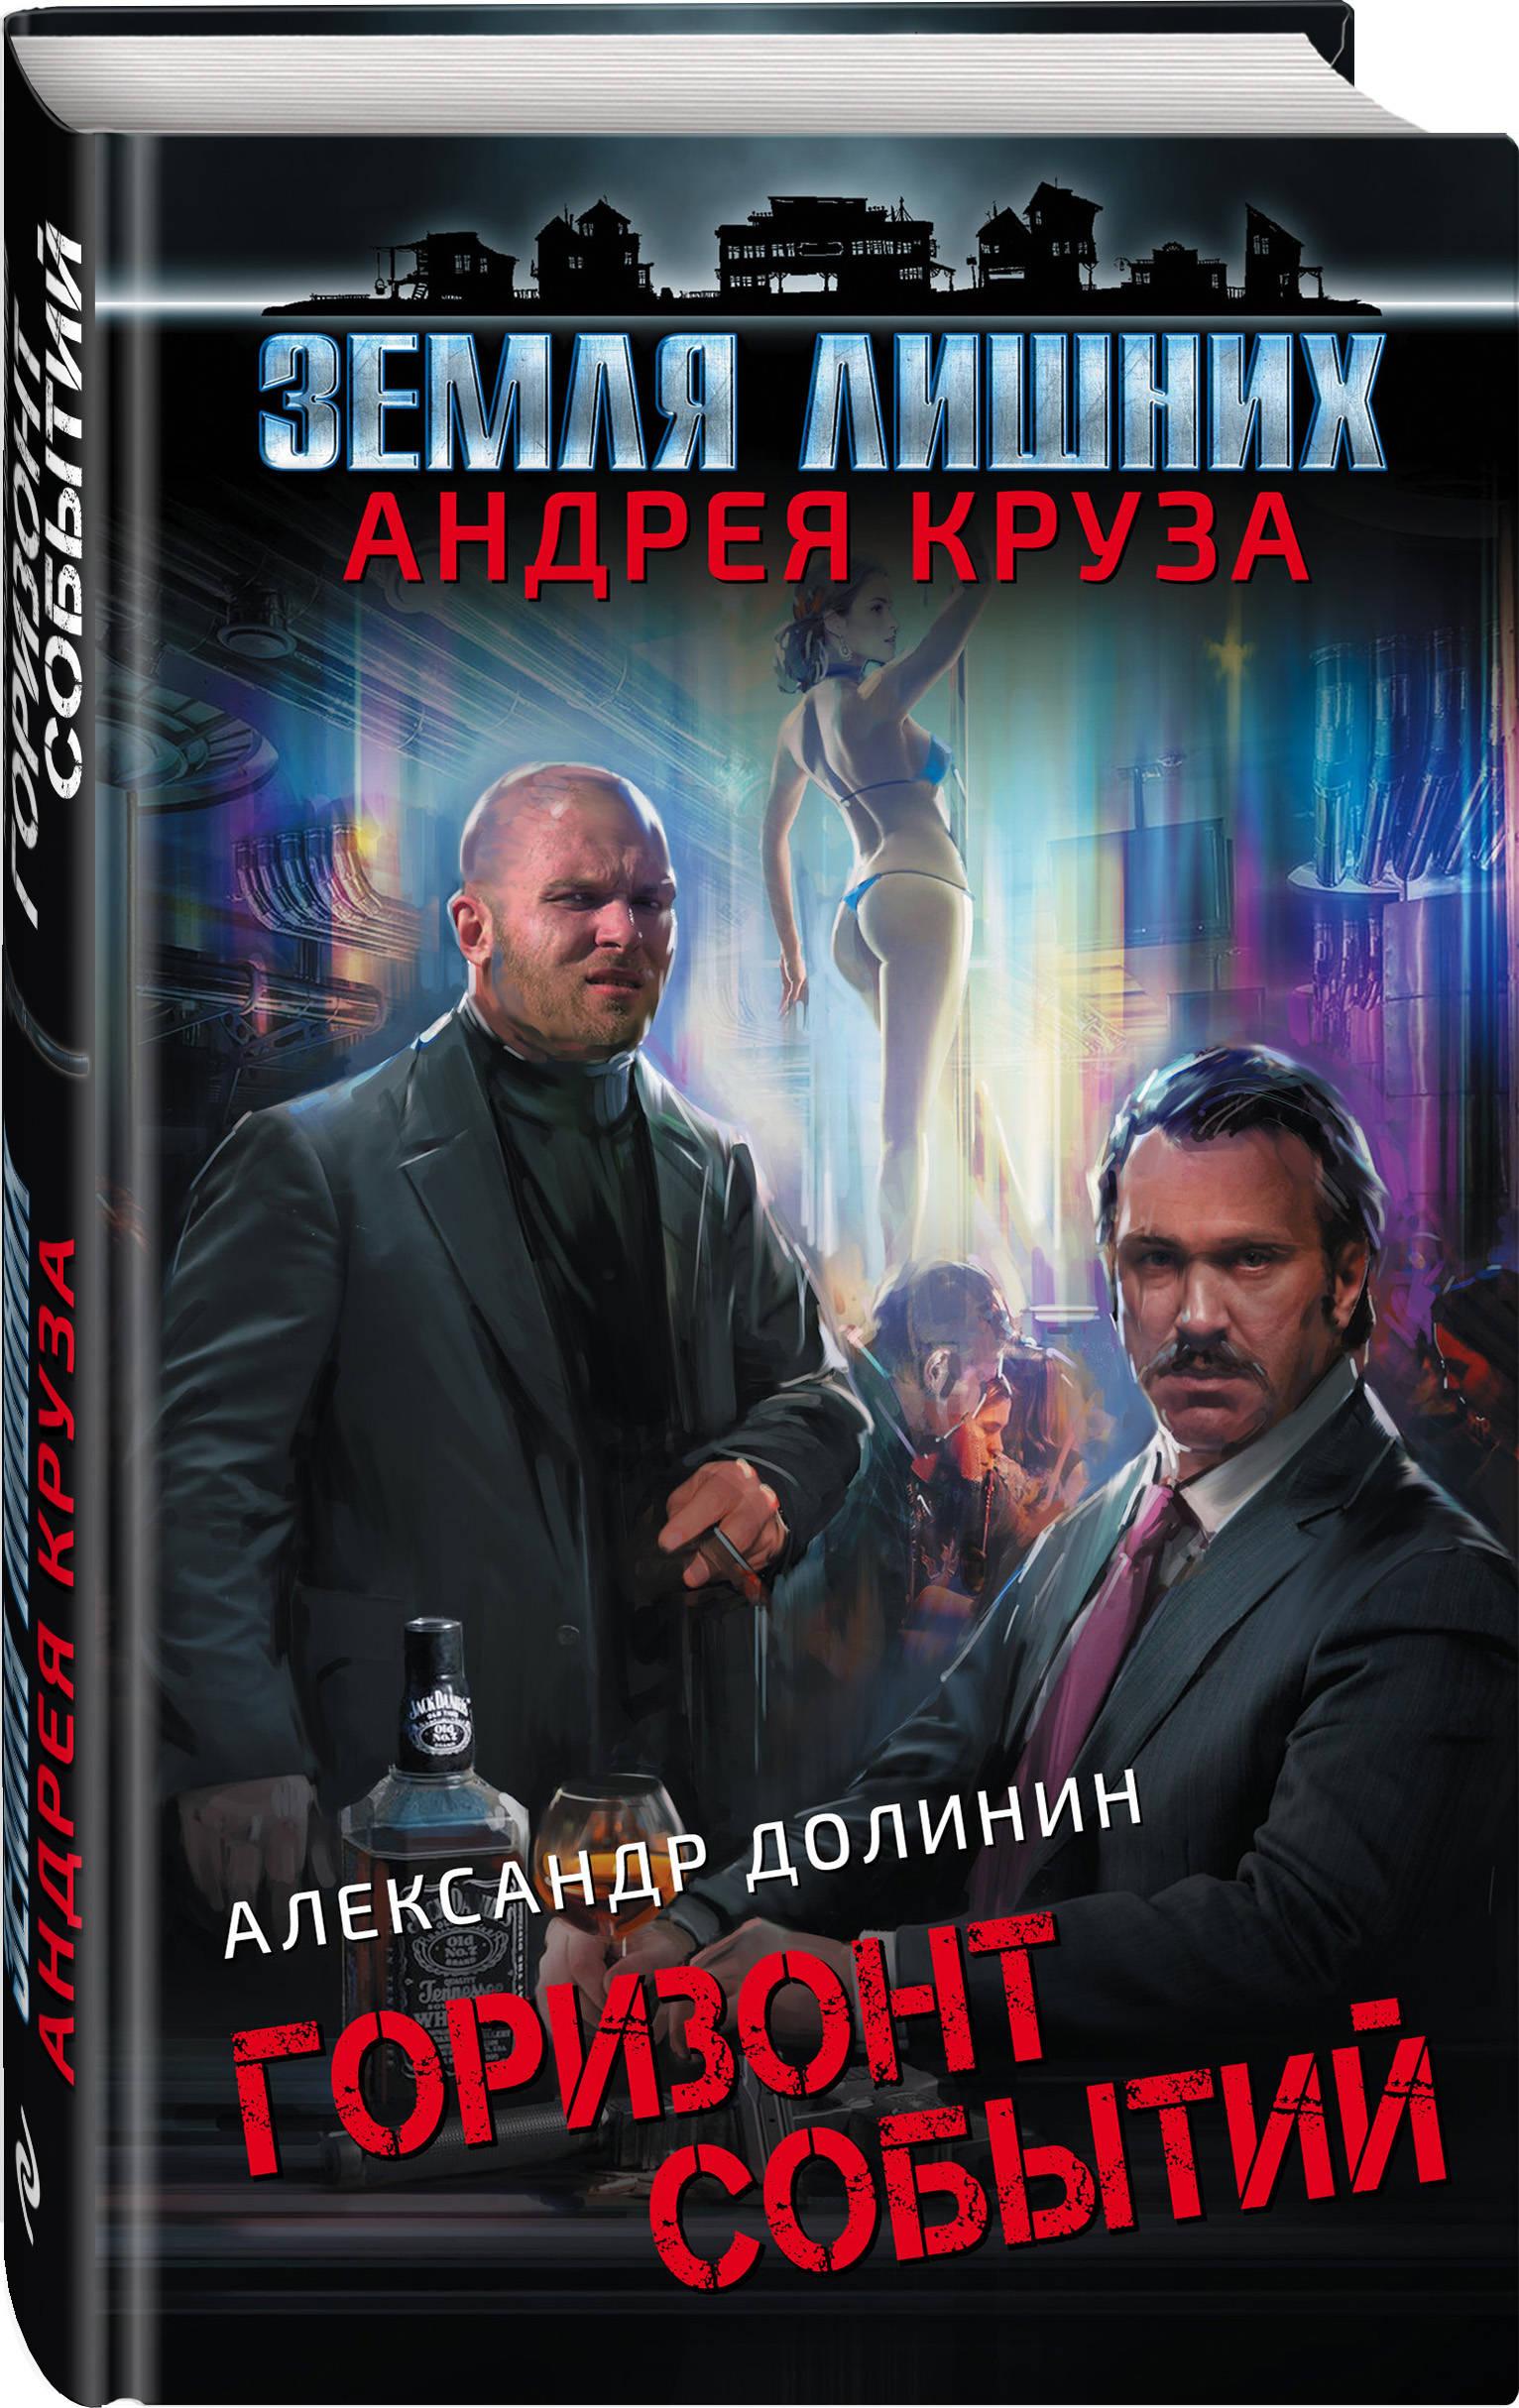 Круз Андрей, Долинин Александр Александрович Земля лишних. Горизонт событий